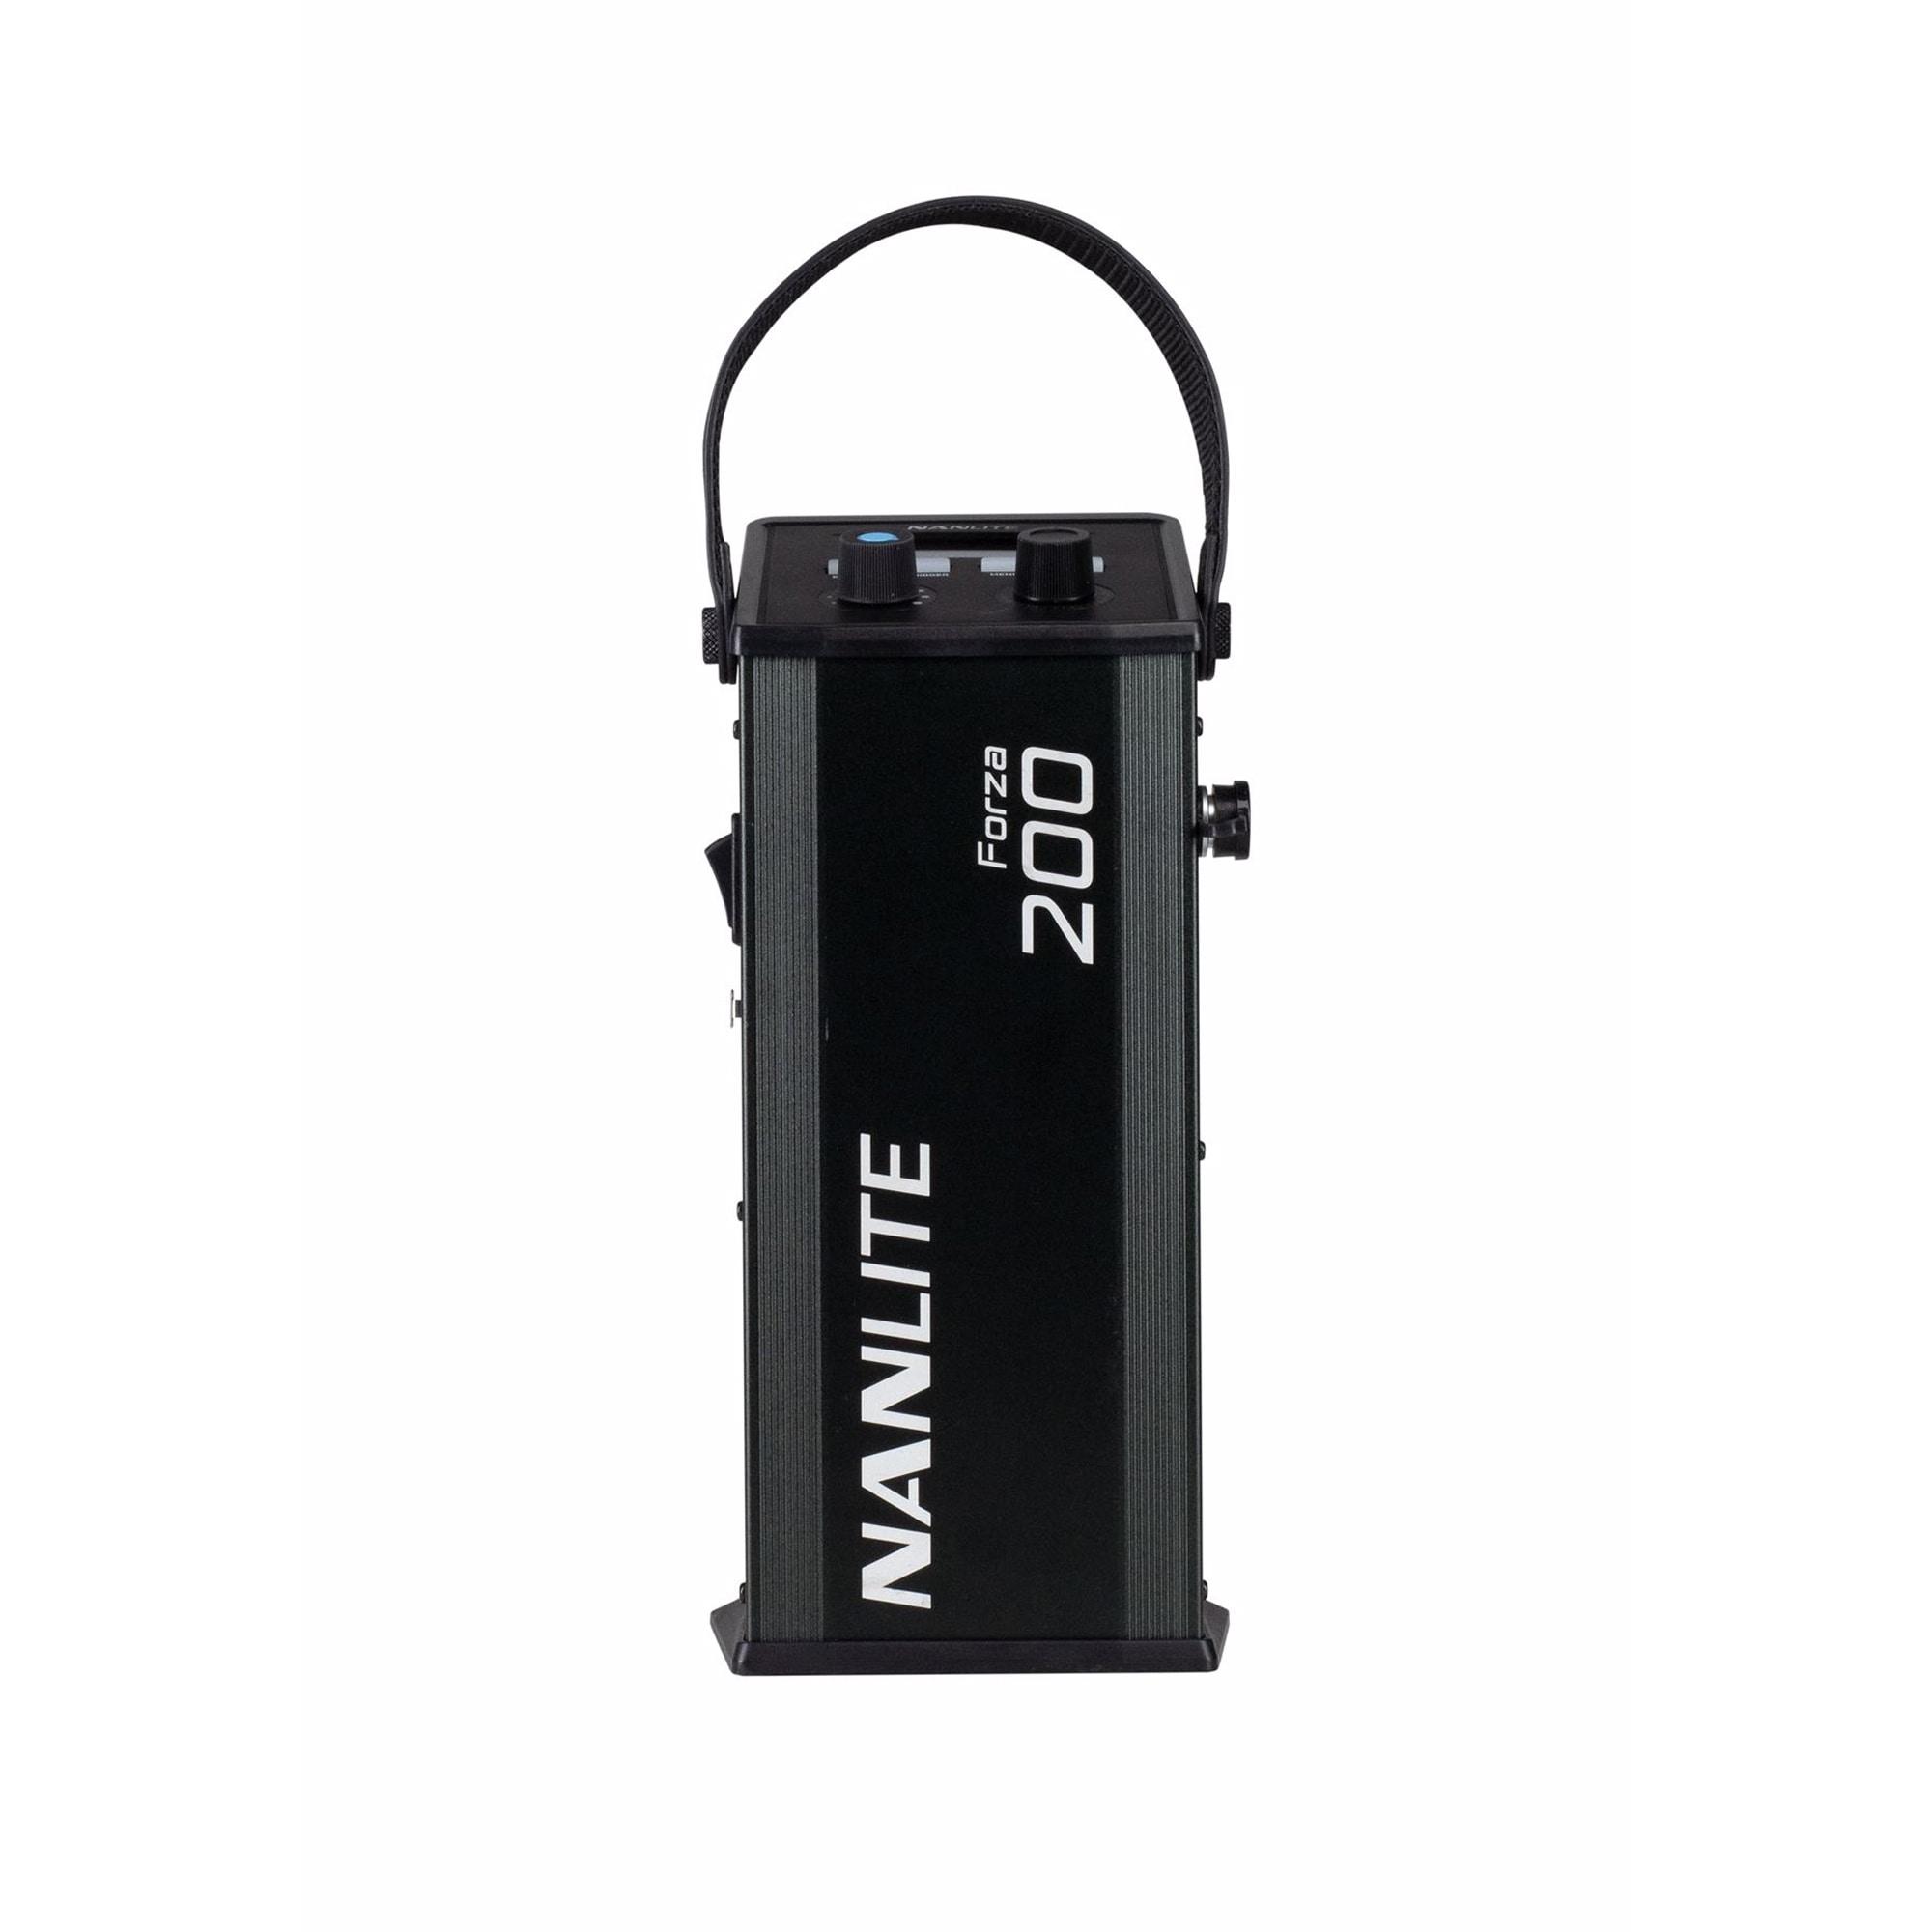 Nanlite Forza 200